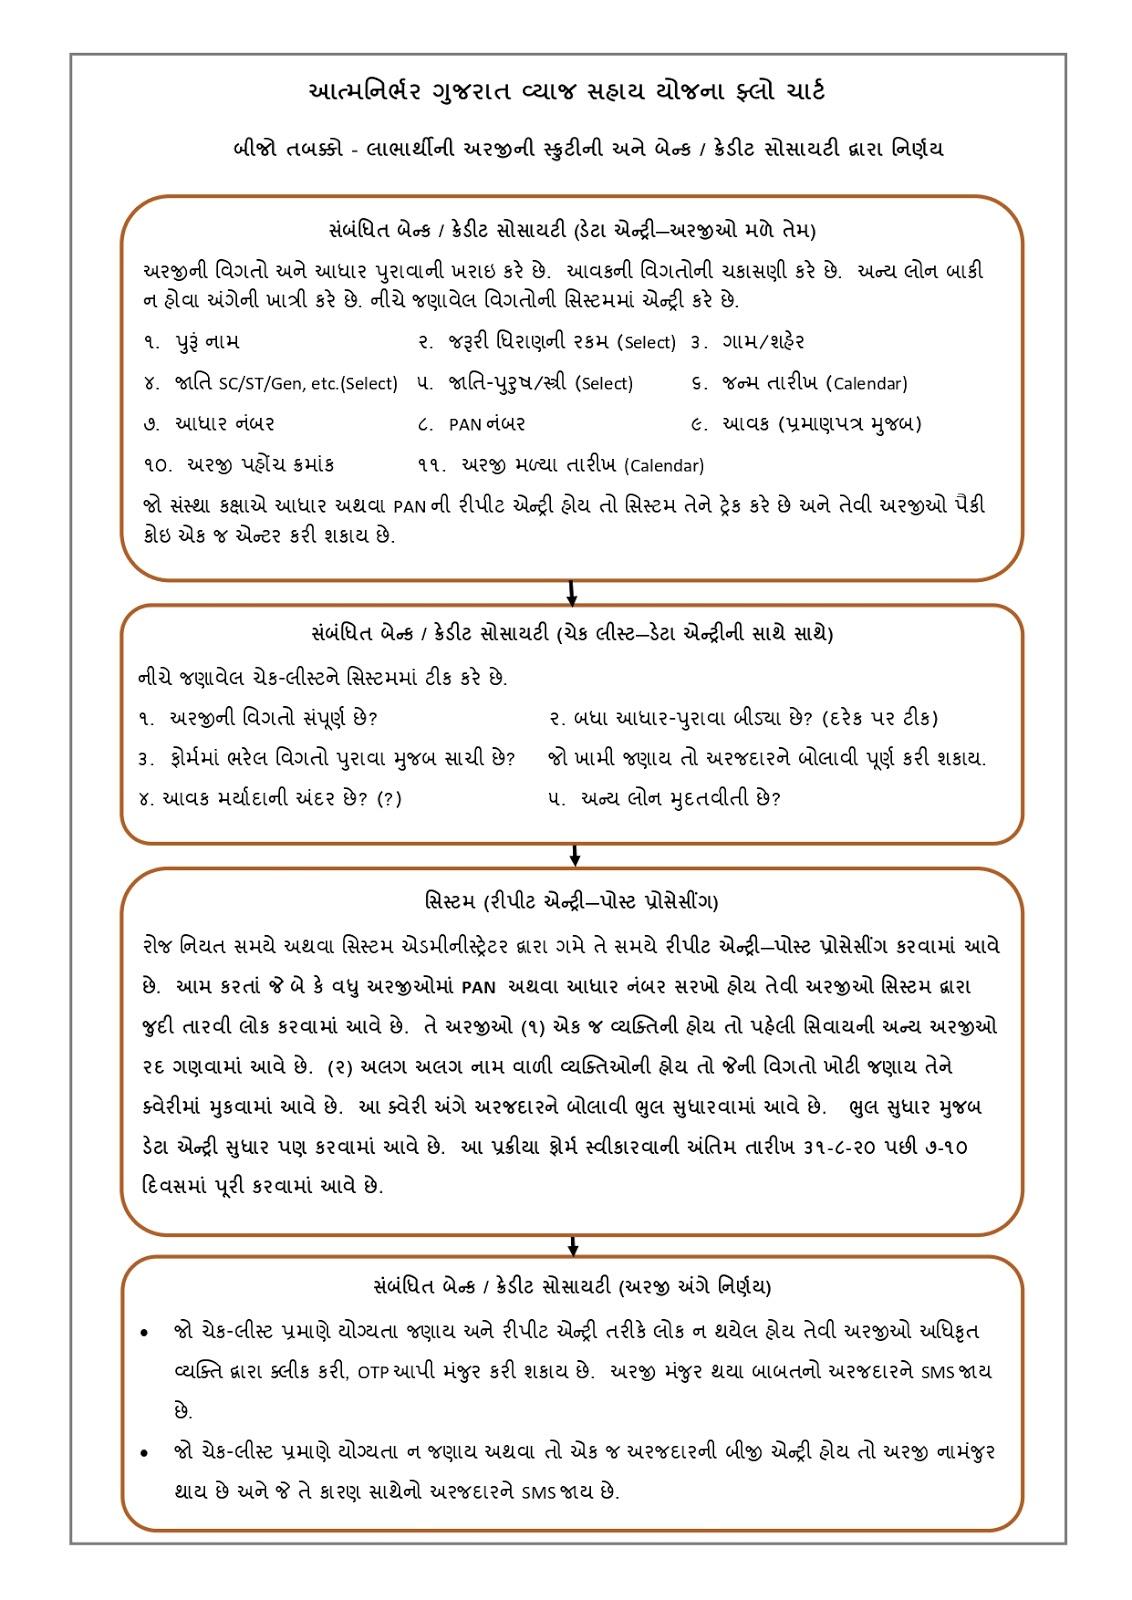 Atmanirbhar Gujarat Sahay Yojana (AGSY) 2020 Form Download